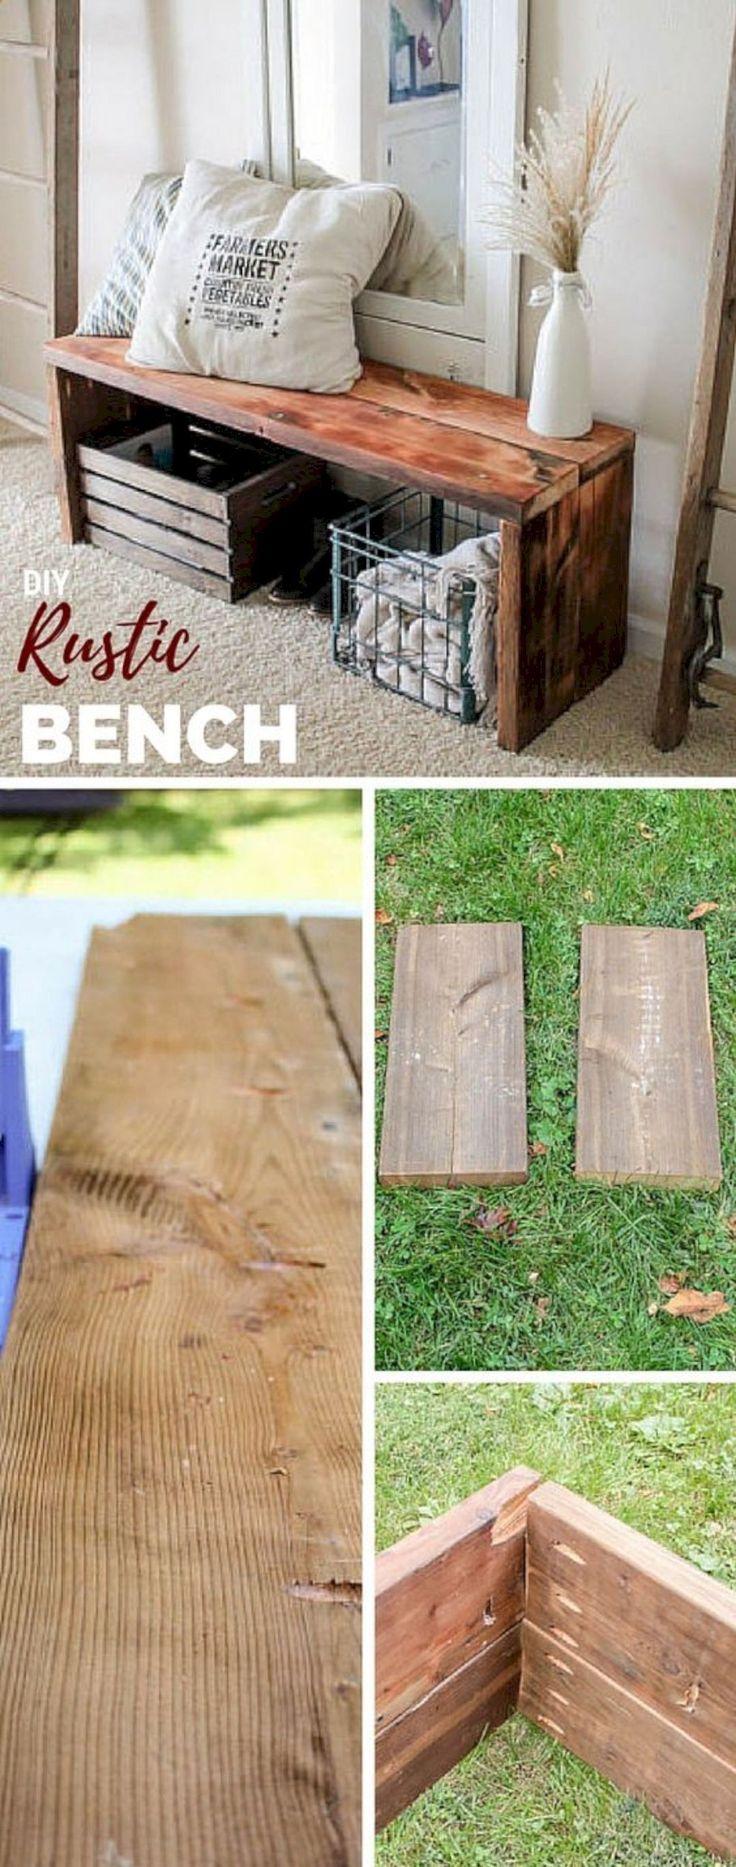 17 diy rustic home decor ideas for living room https www for Diy room decor ideas nim c